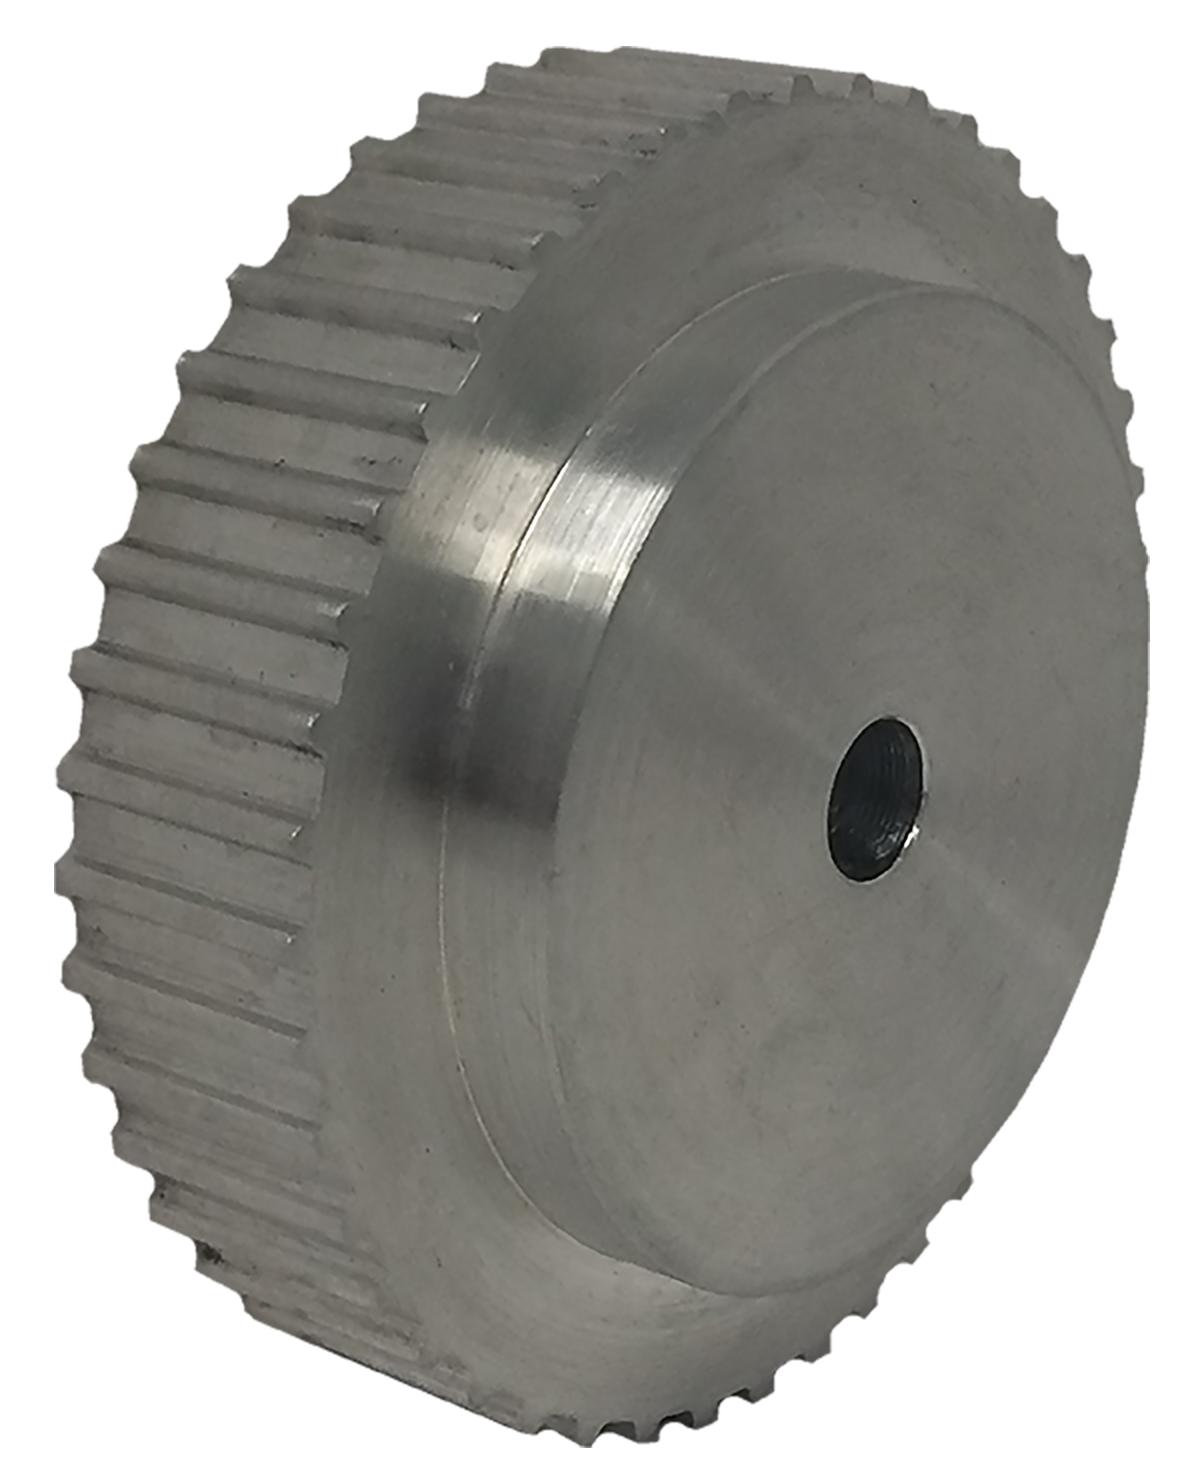 21AT5/44-0 - Aluminum Metric Pulleys